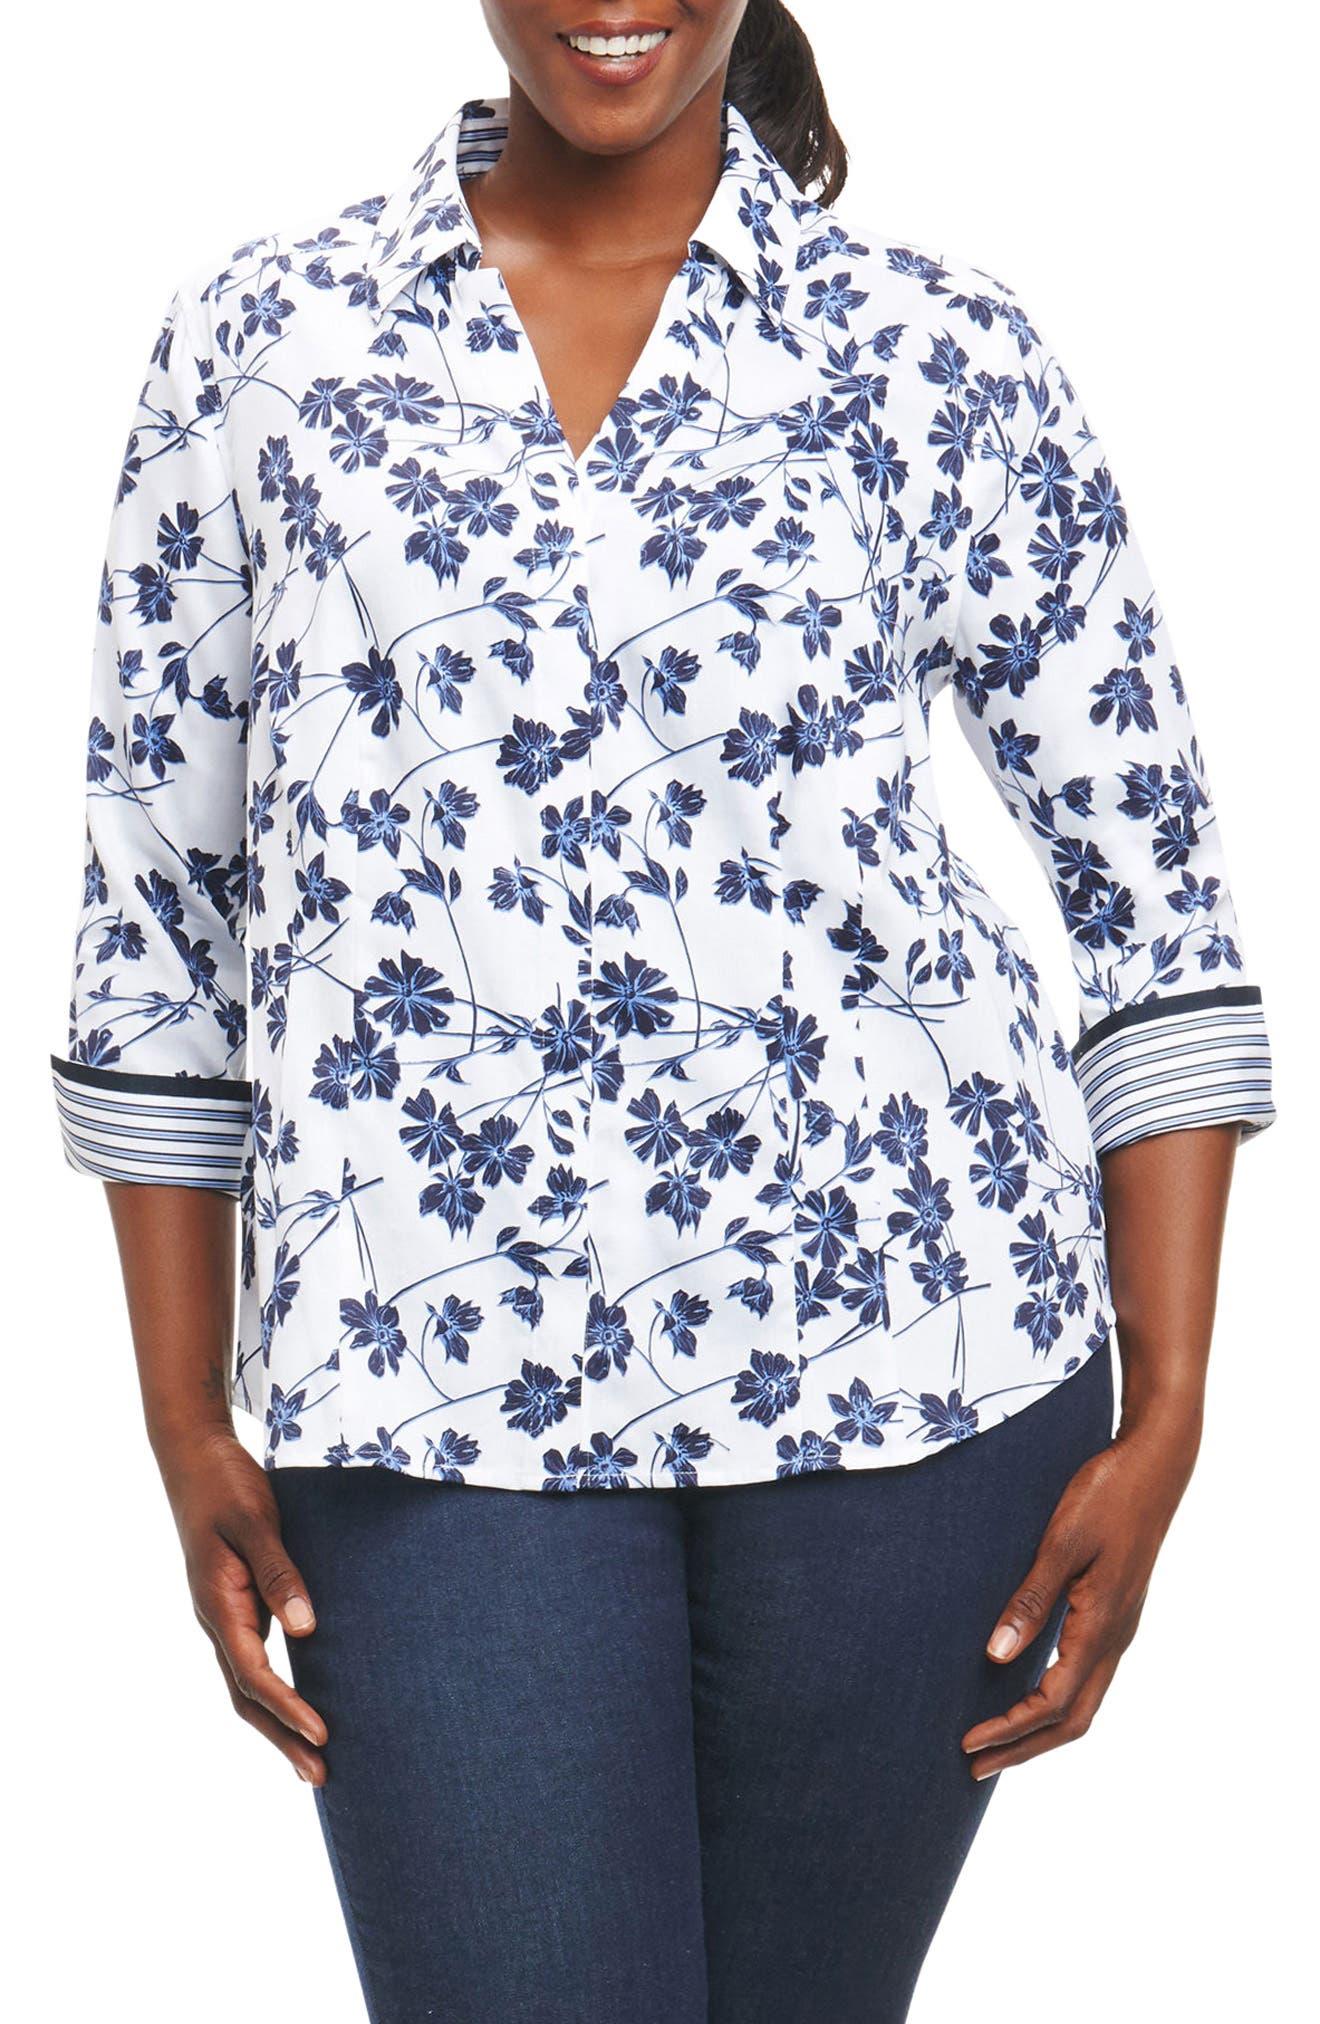 Alternate Image 1 Selected - Foxcroft Taylor Floral Print Shirt (Plus Size)